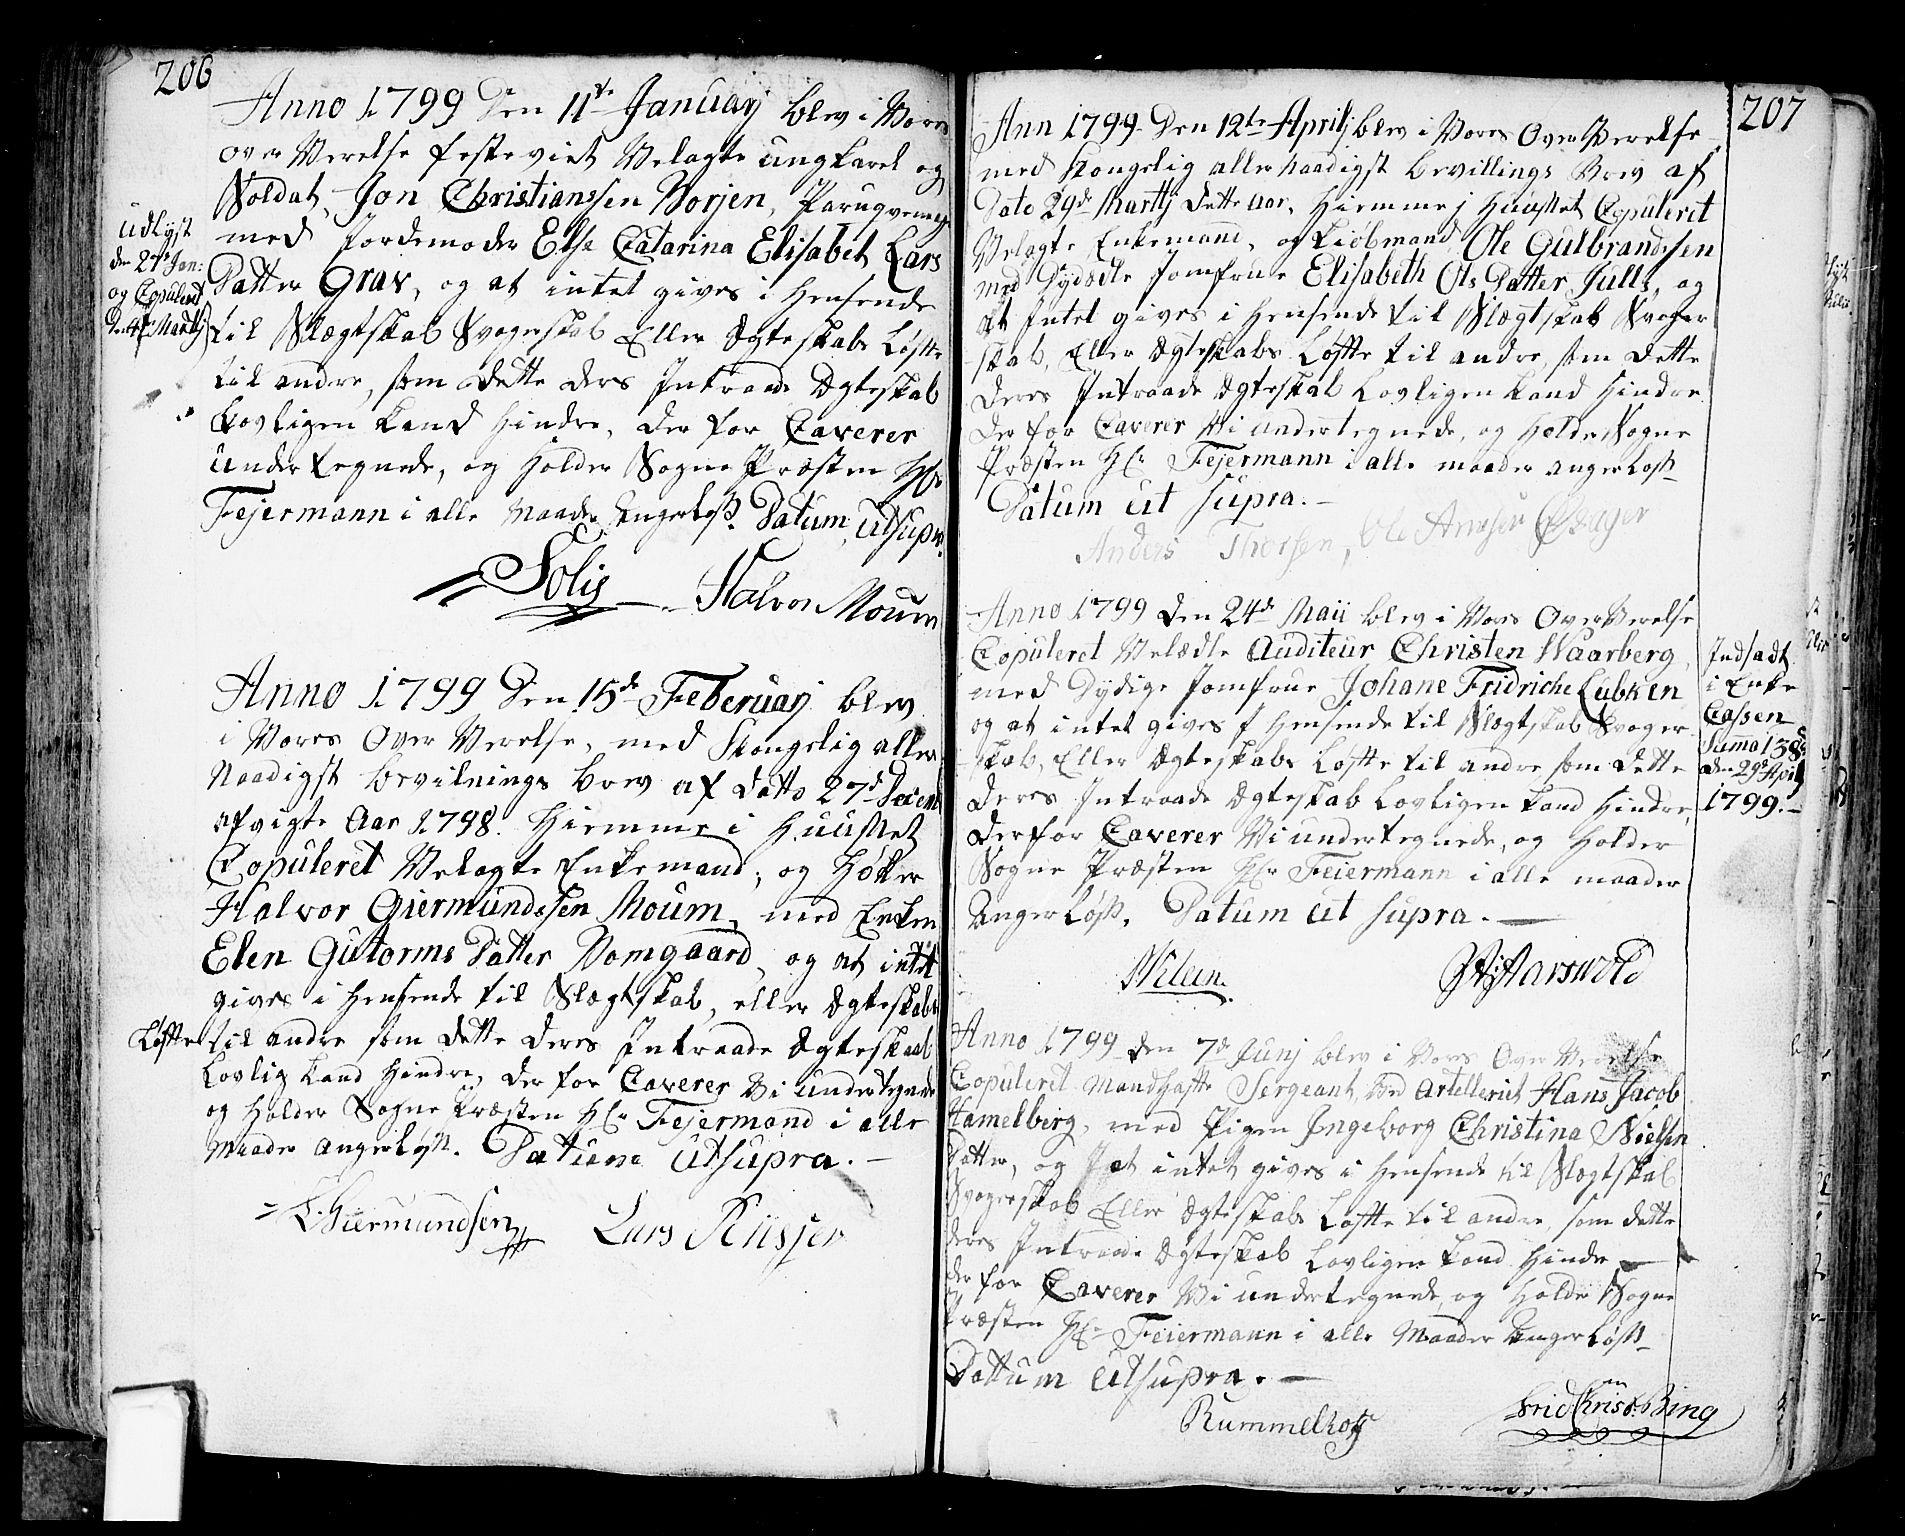 SAO, Fredrikstad prestekontor Kirkebøker, F/Fa/L0002: Parish register (official) no. 2, 1750-1804, p. 206-207